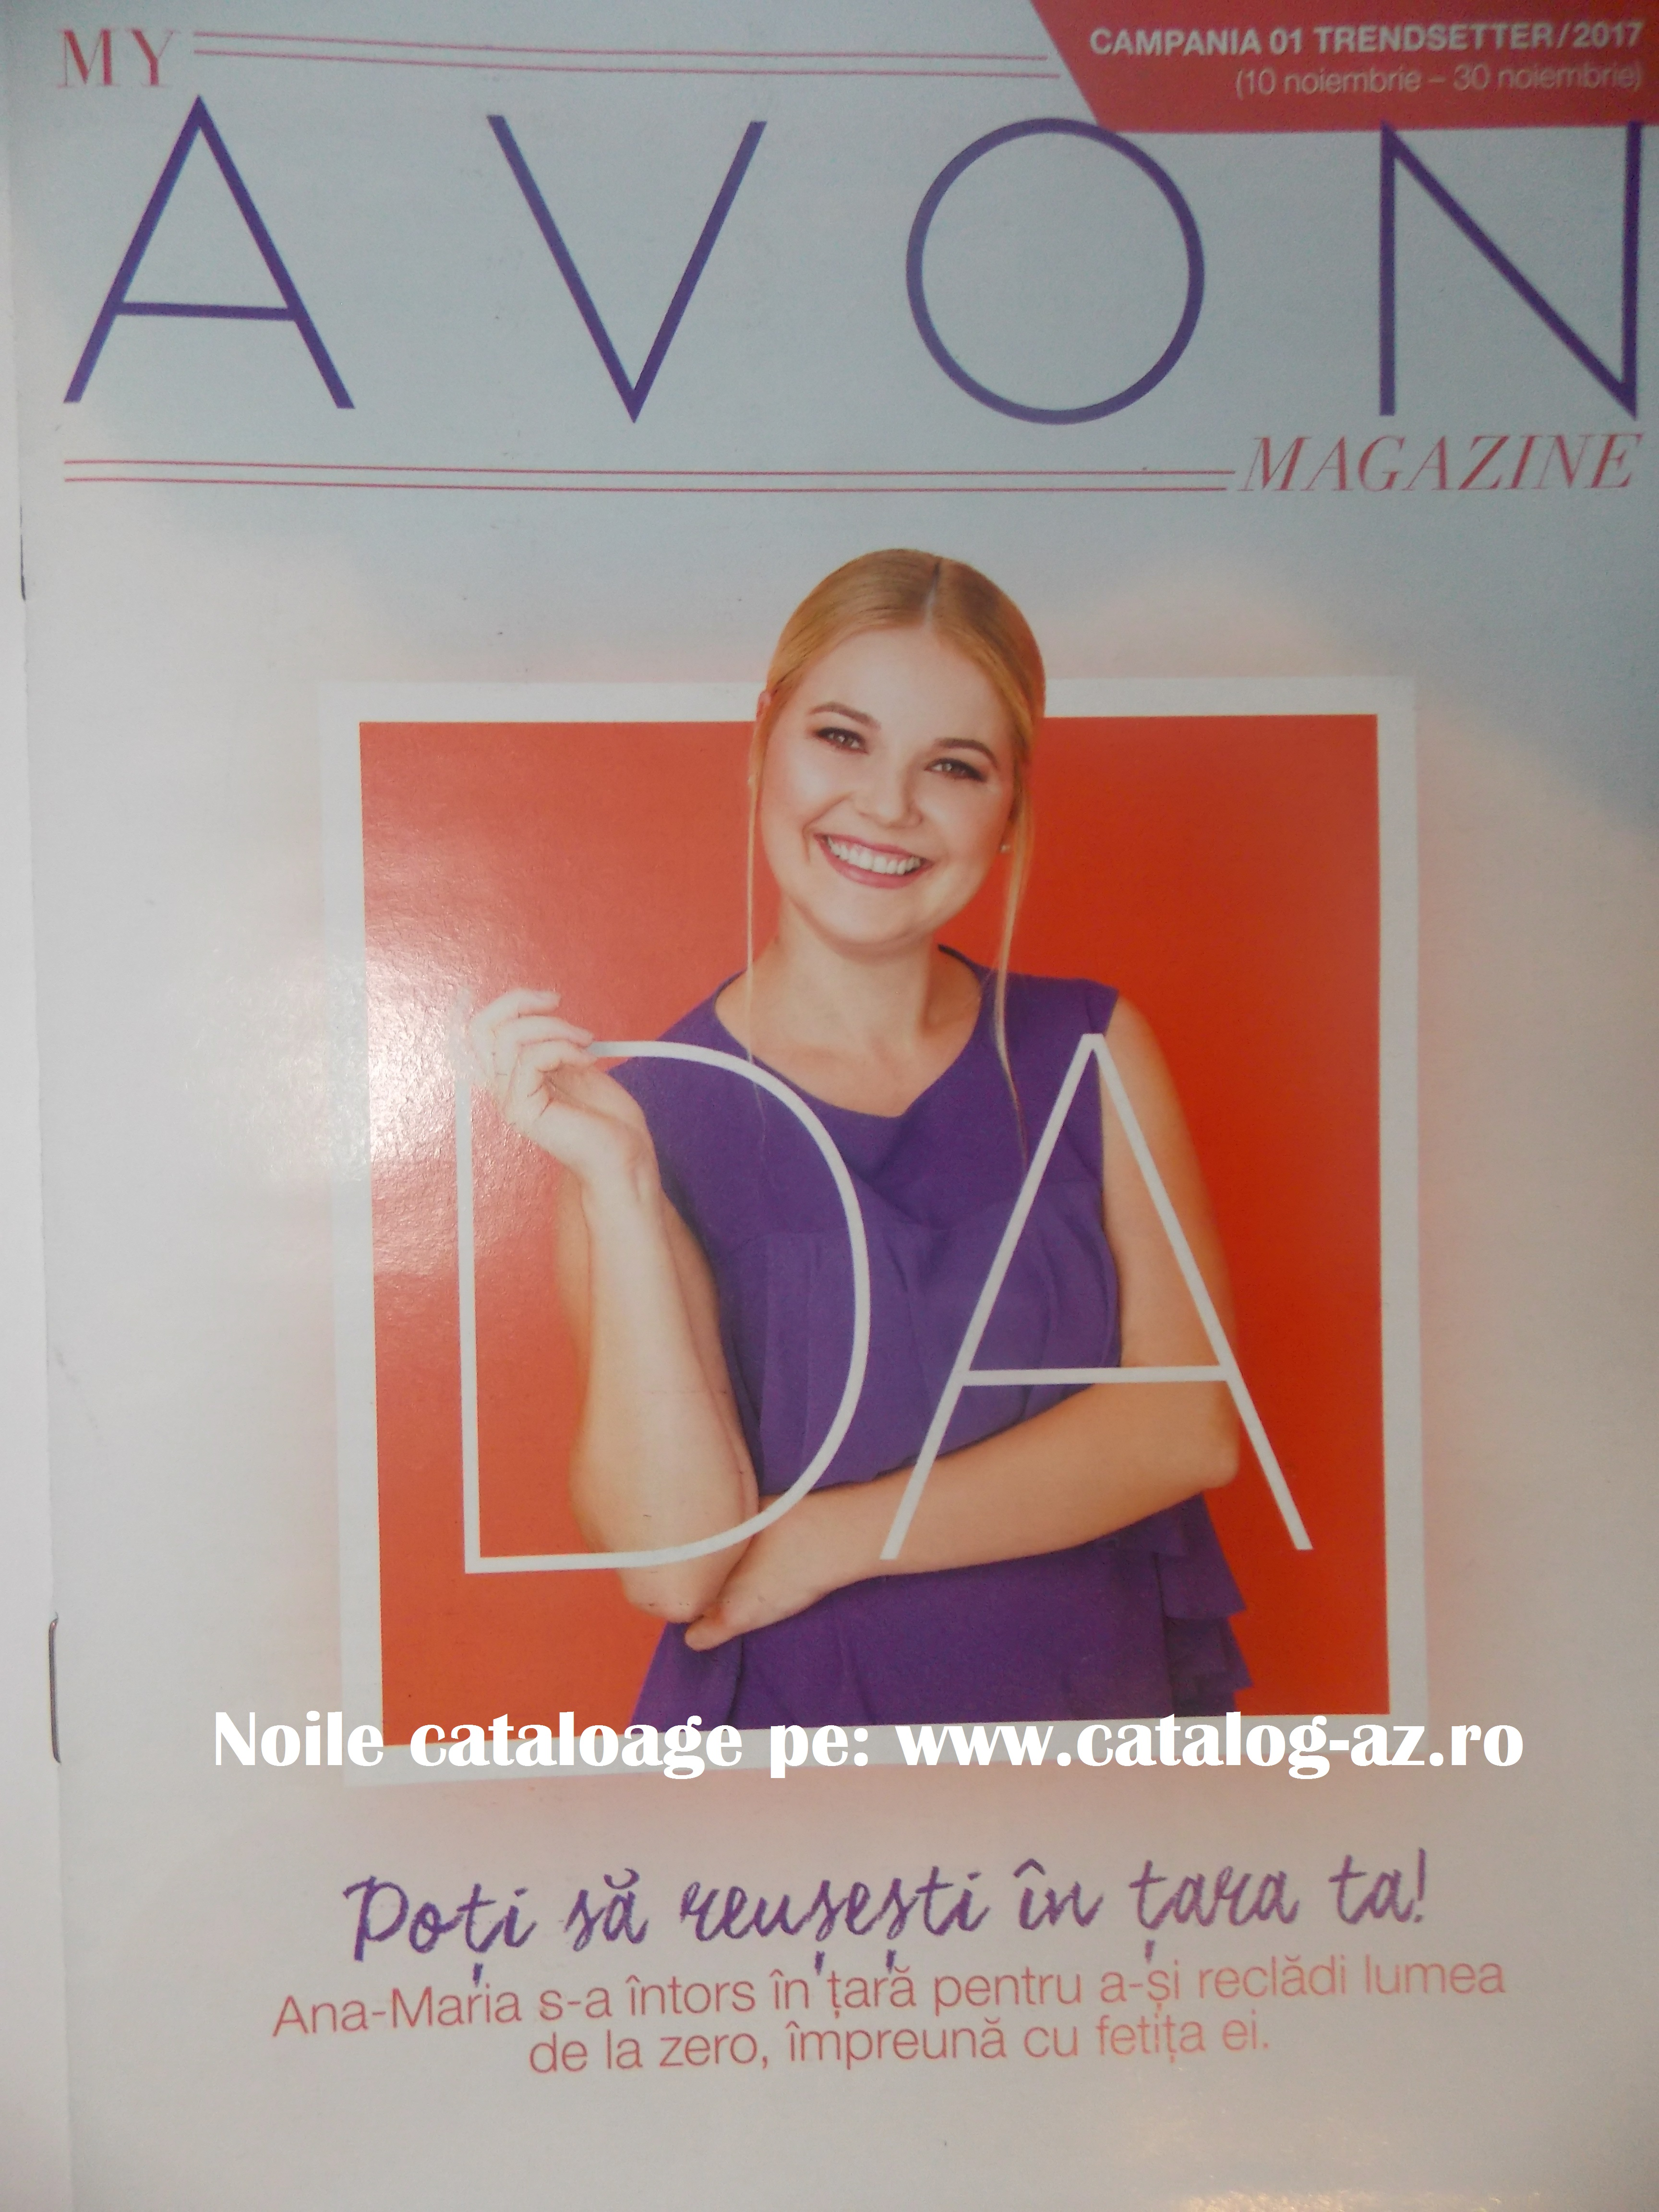 Catalog My Avon Magazine Campania 01 2017 - Catalog AZ